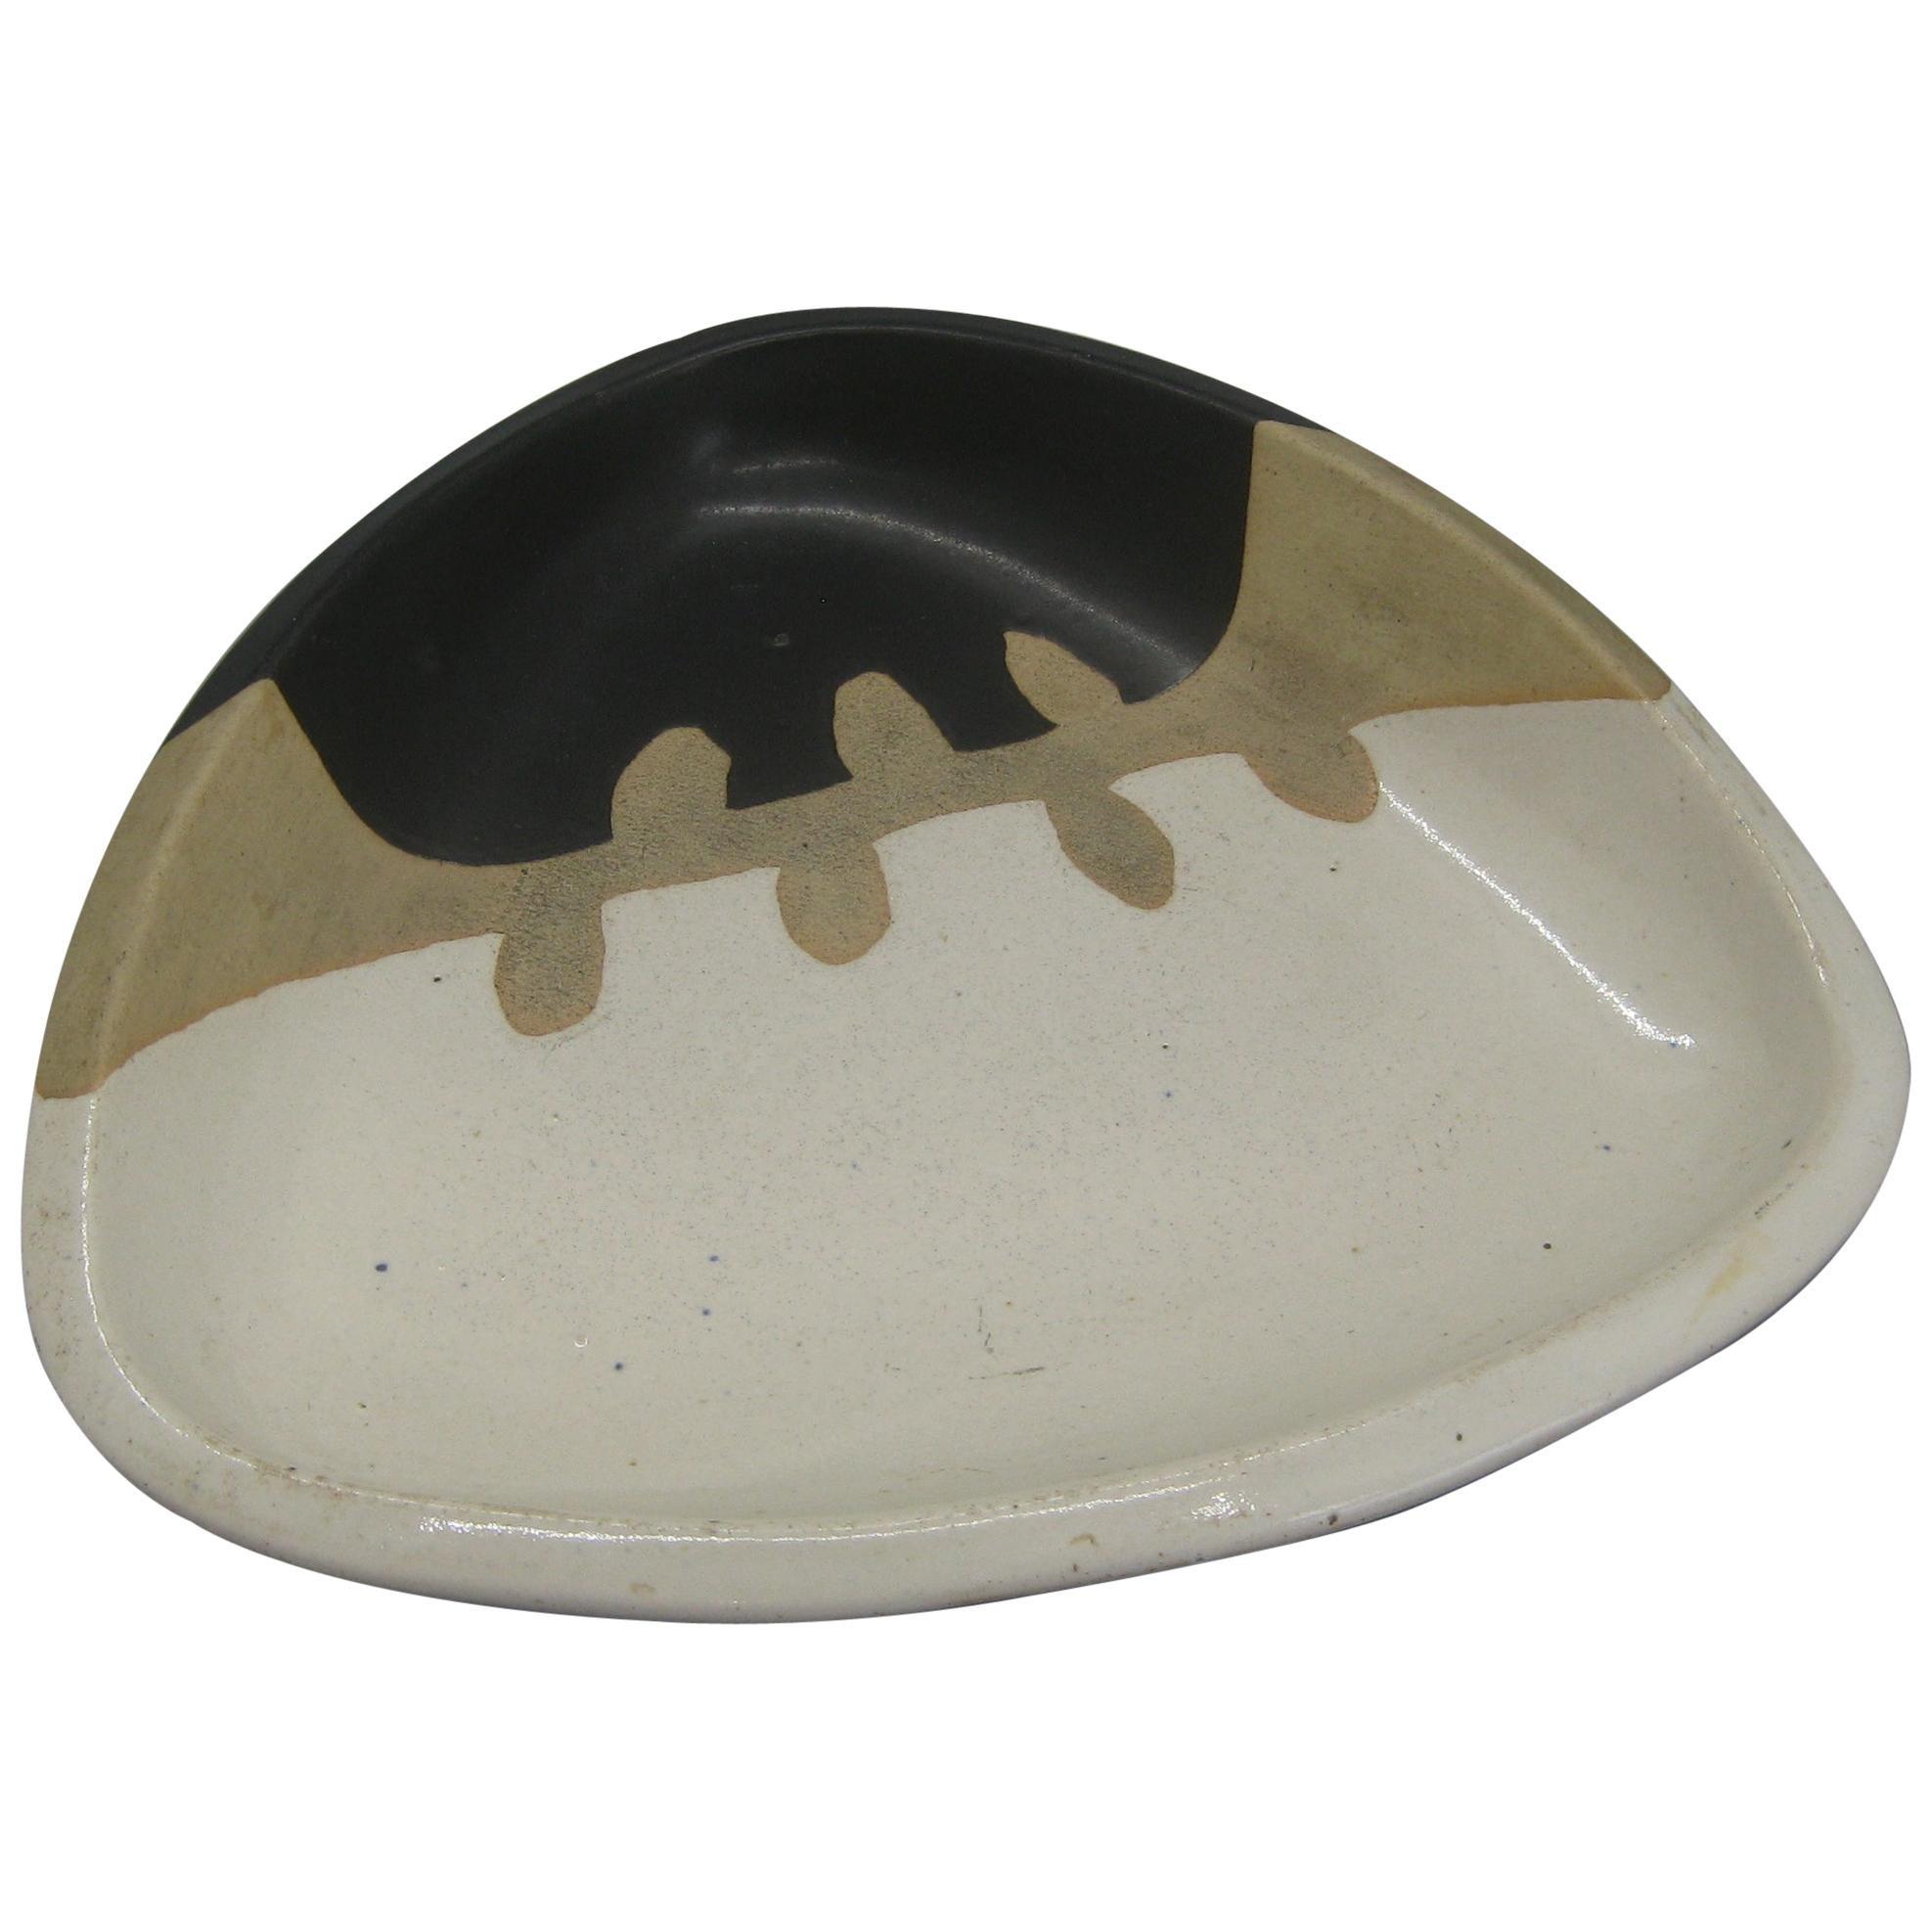 1960s Walter Dexter Studio Pottery Modernist Abstract Bowl Ceramic Arts Calgary